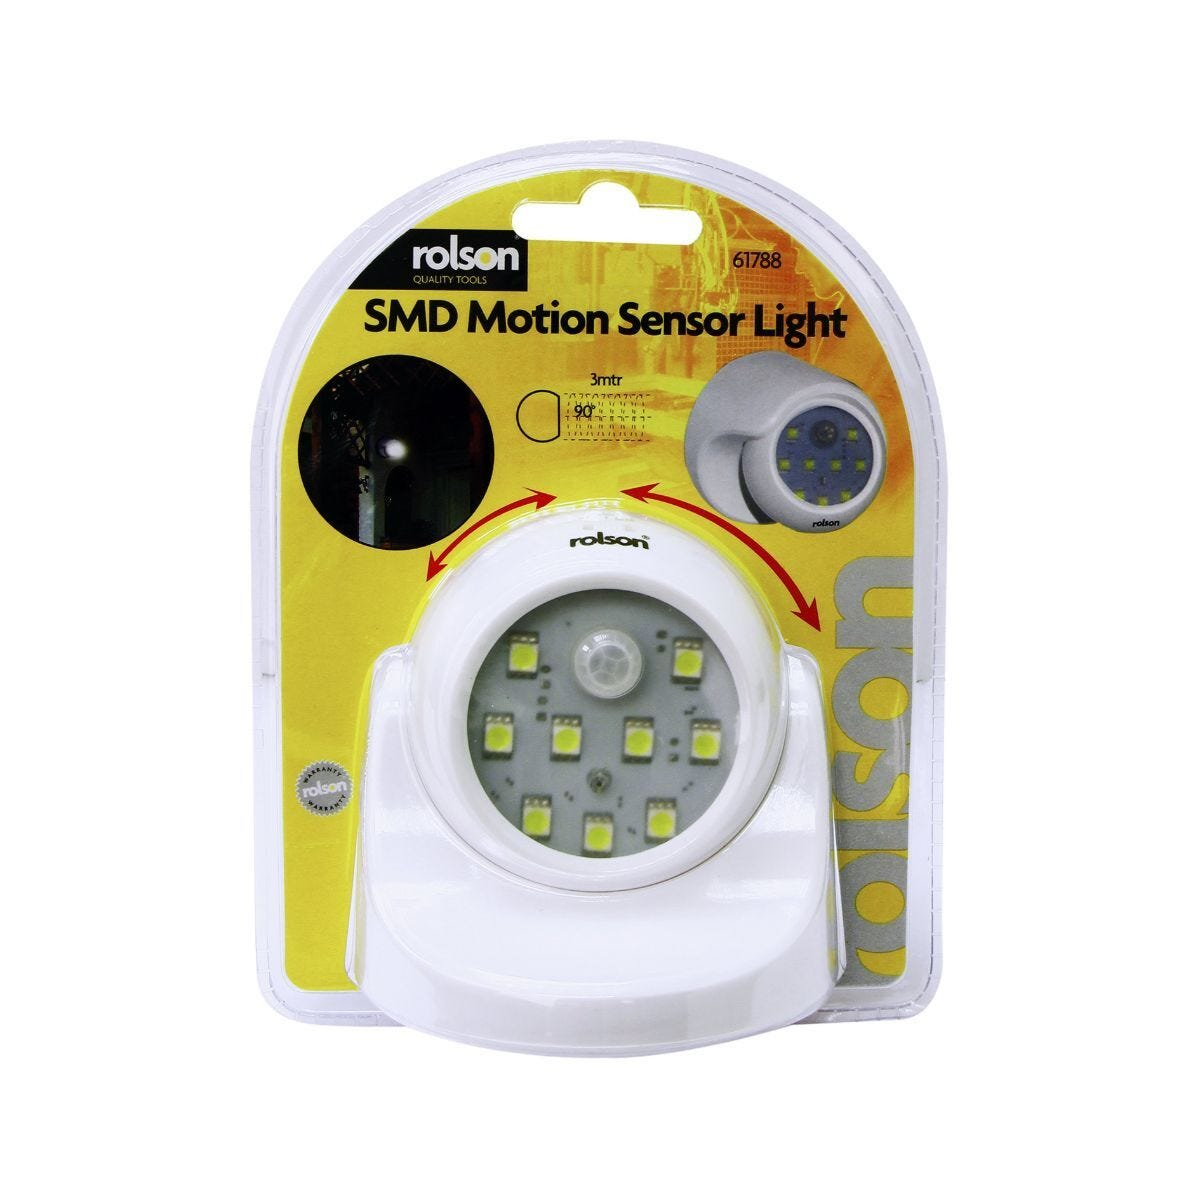 9 SMD Motion Sensor Light